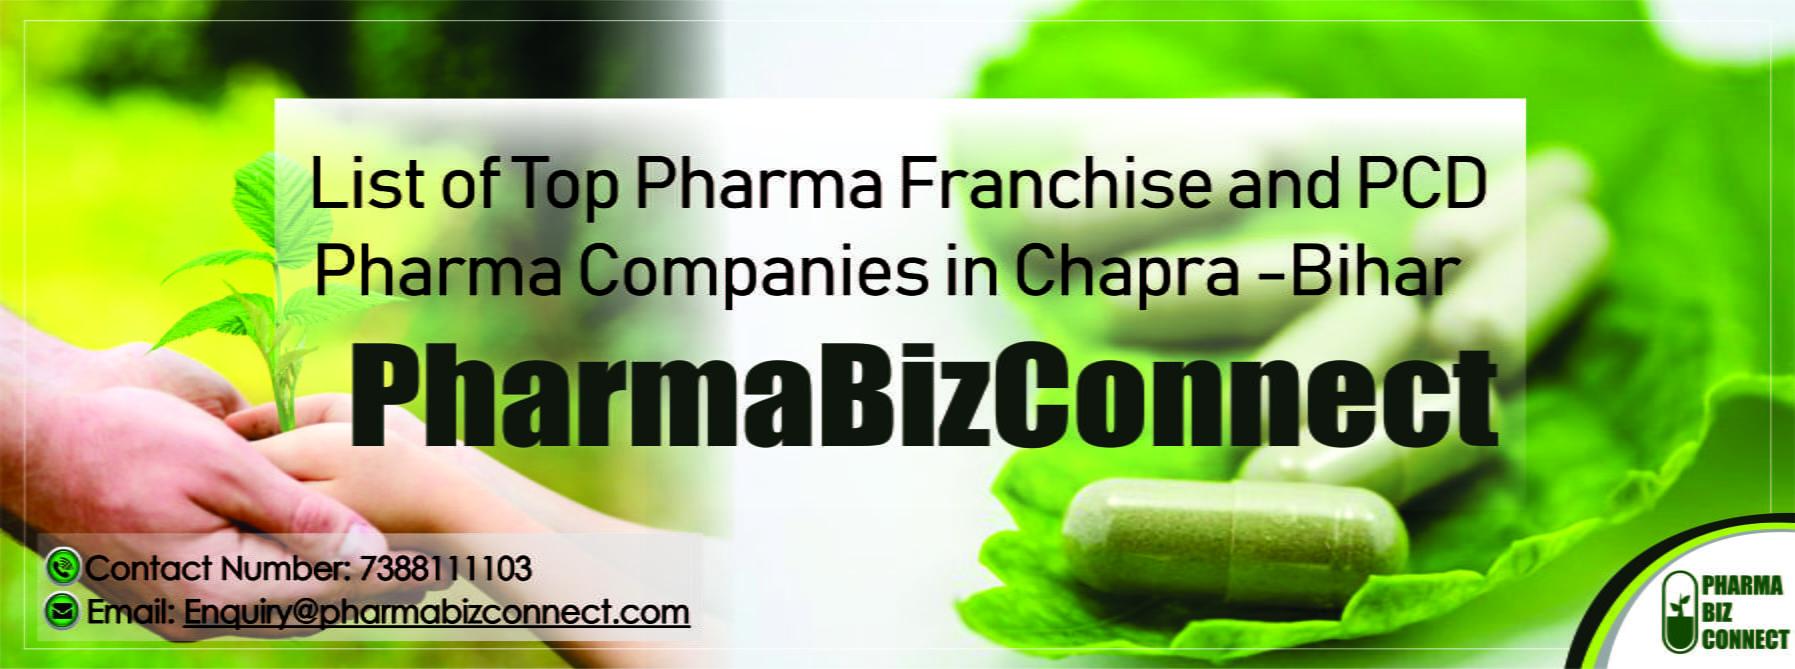 PharmaBizConnect Introduces Online Marketing Portal for Psychiatric and Neuro Pharma Companies